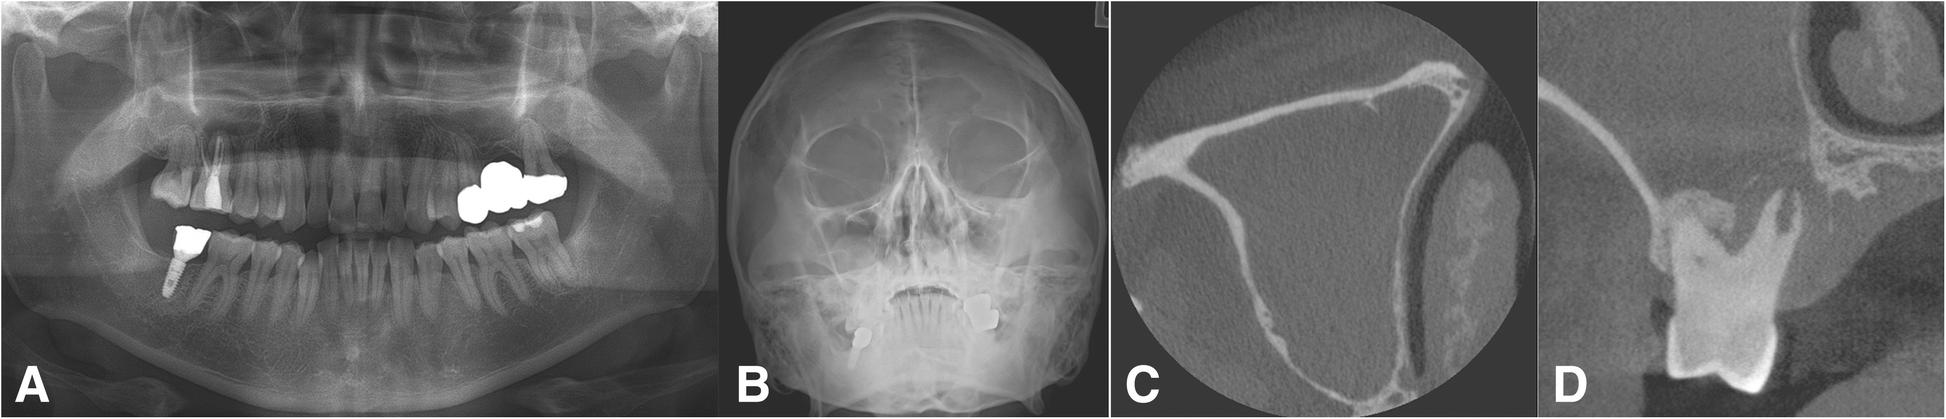 Definition and management of odontogenic maxillary sinusitis